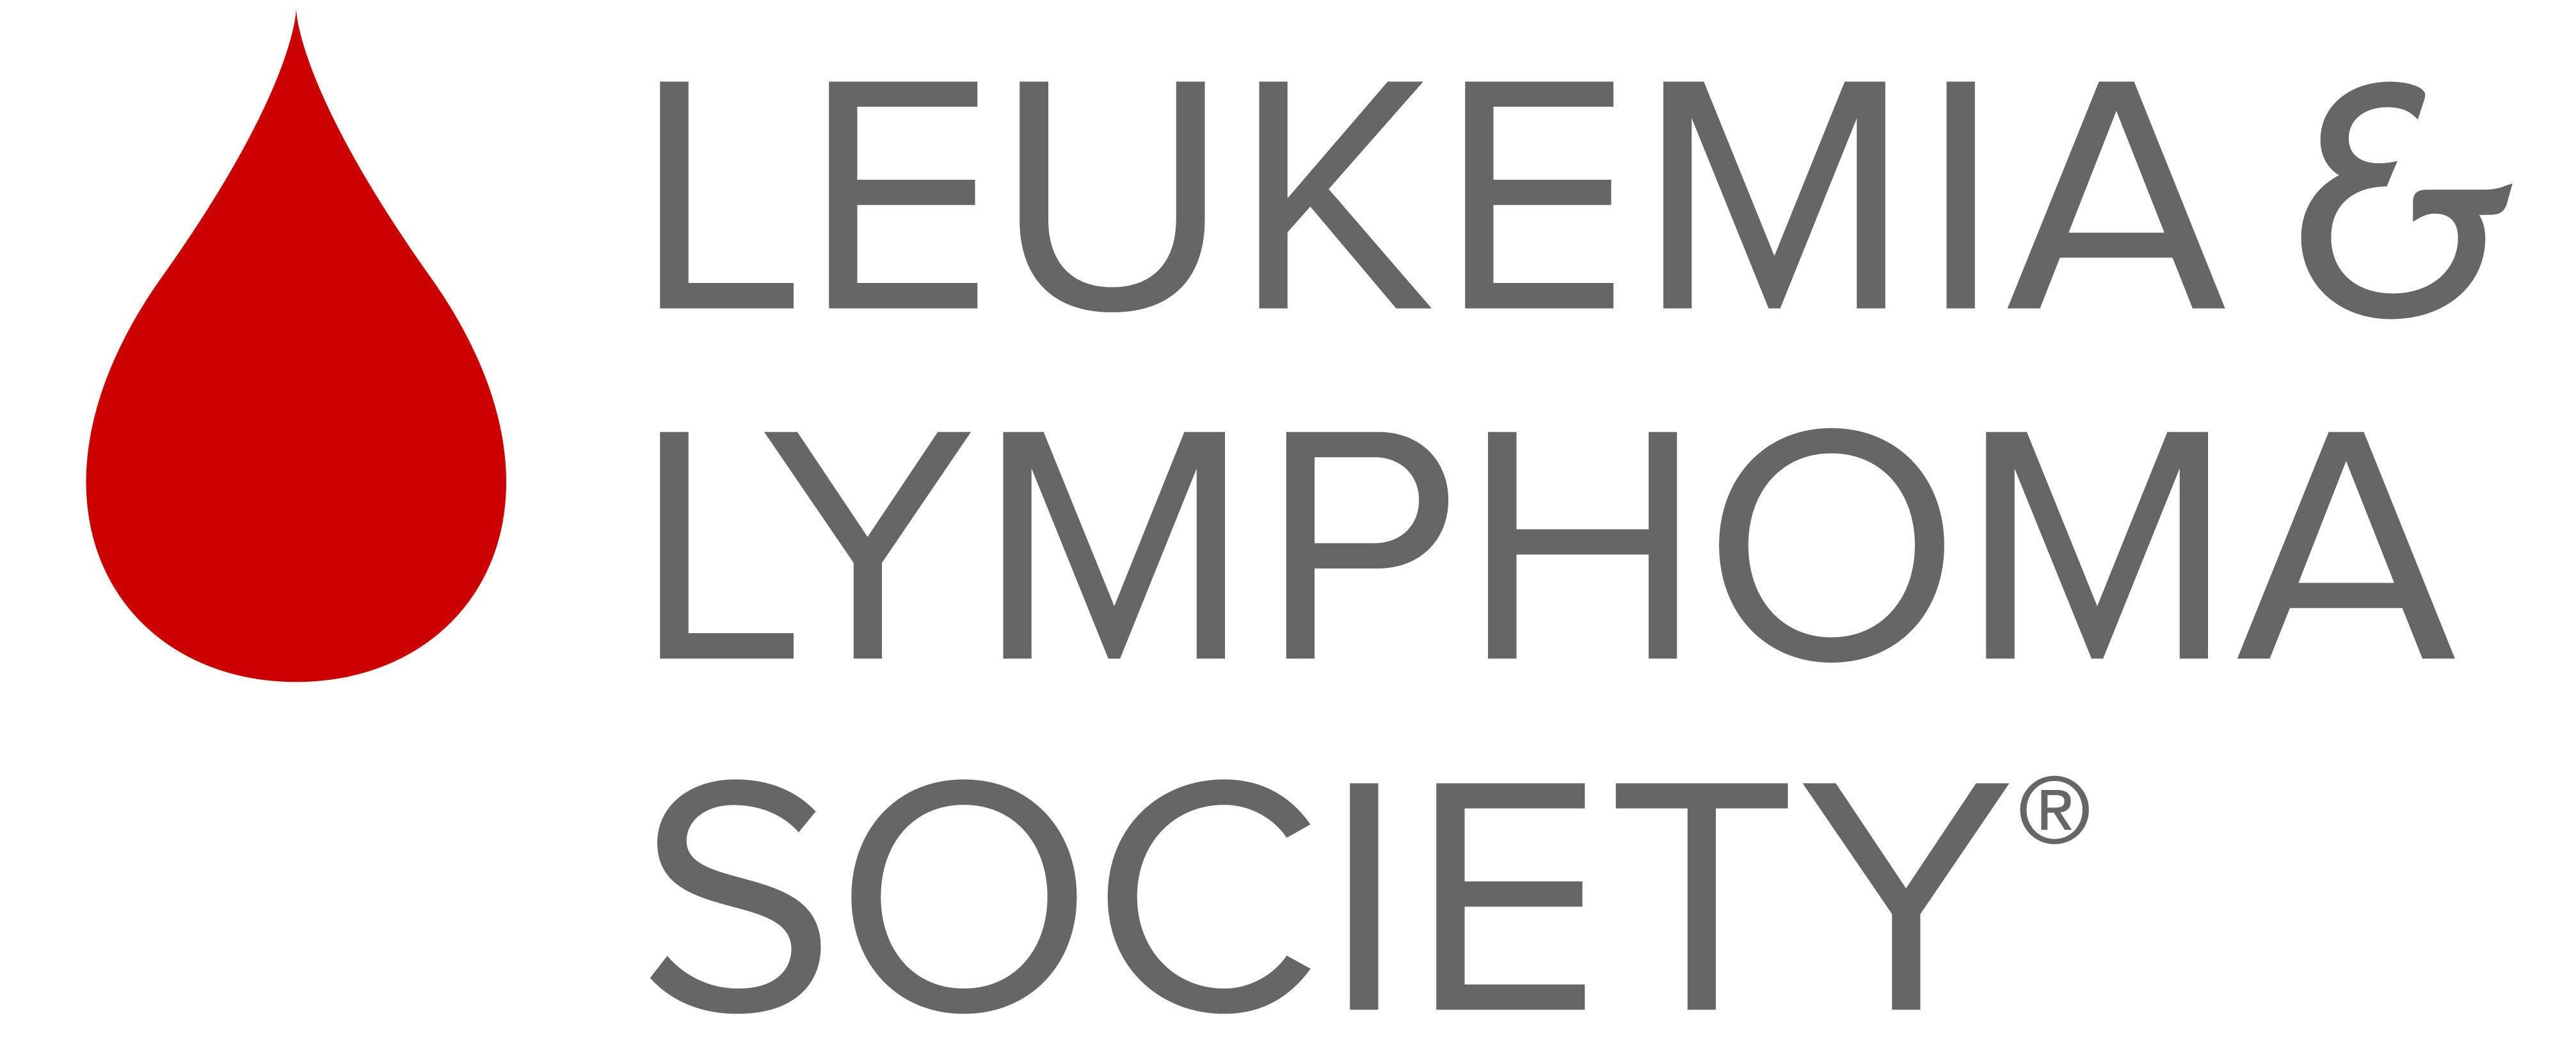 LLS & Vaccines - Leukemia & Lymphoma Society - OHC - Oncology